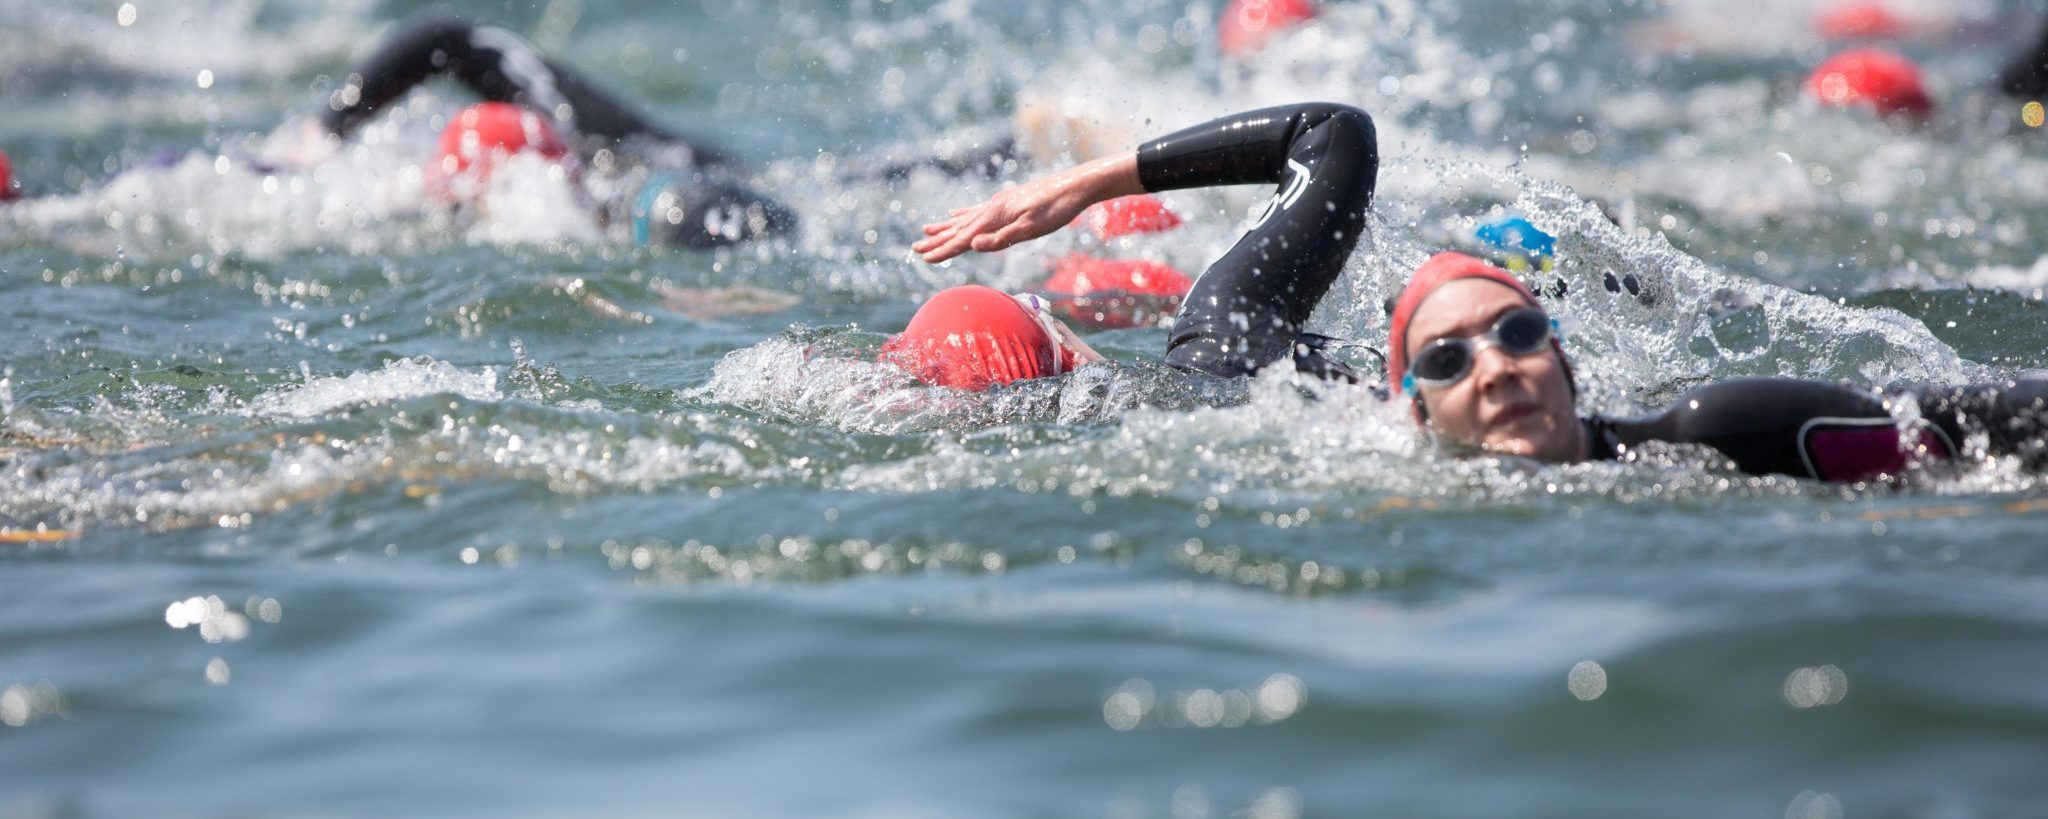 The AJ Bell London Triathlon